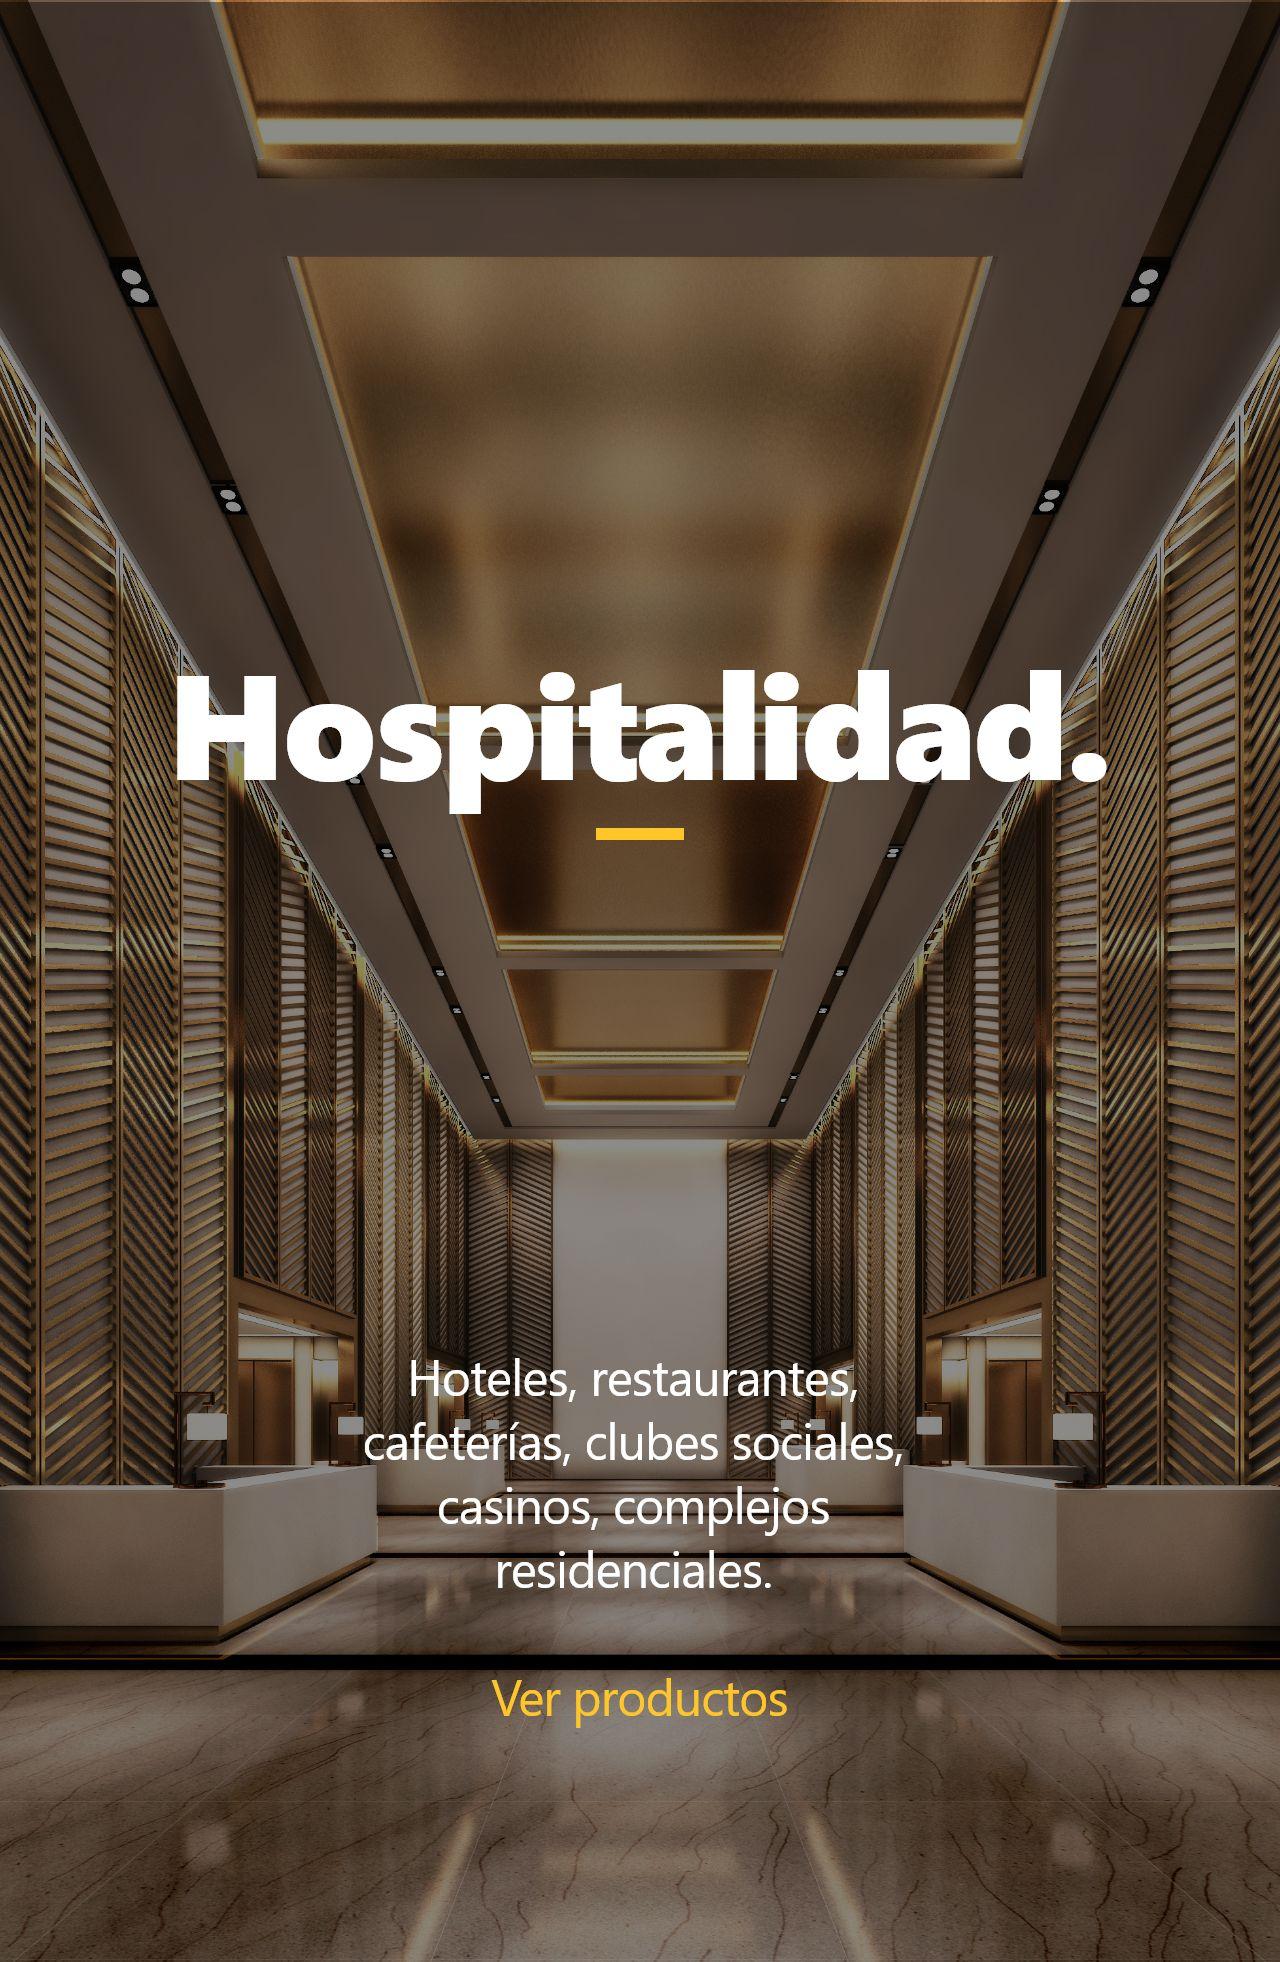 Hospitalidad